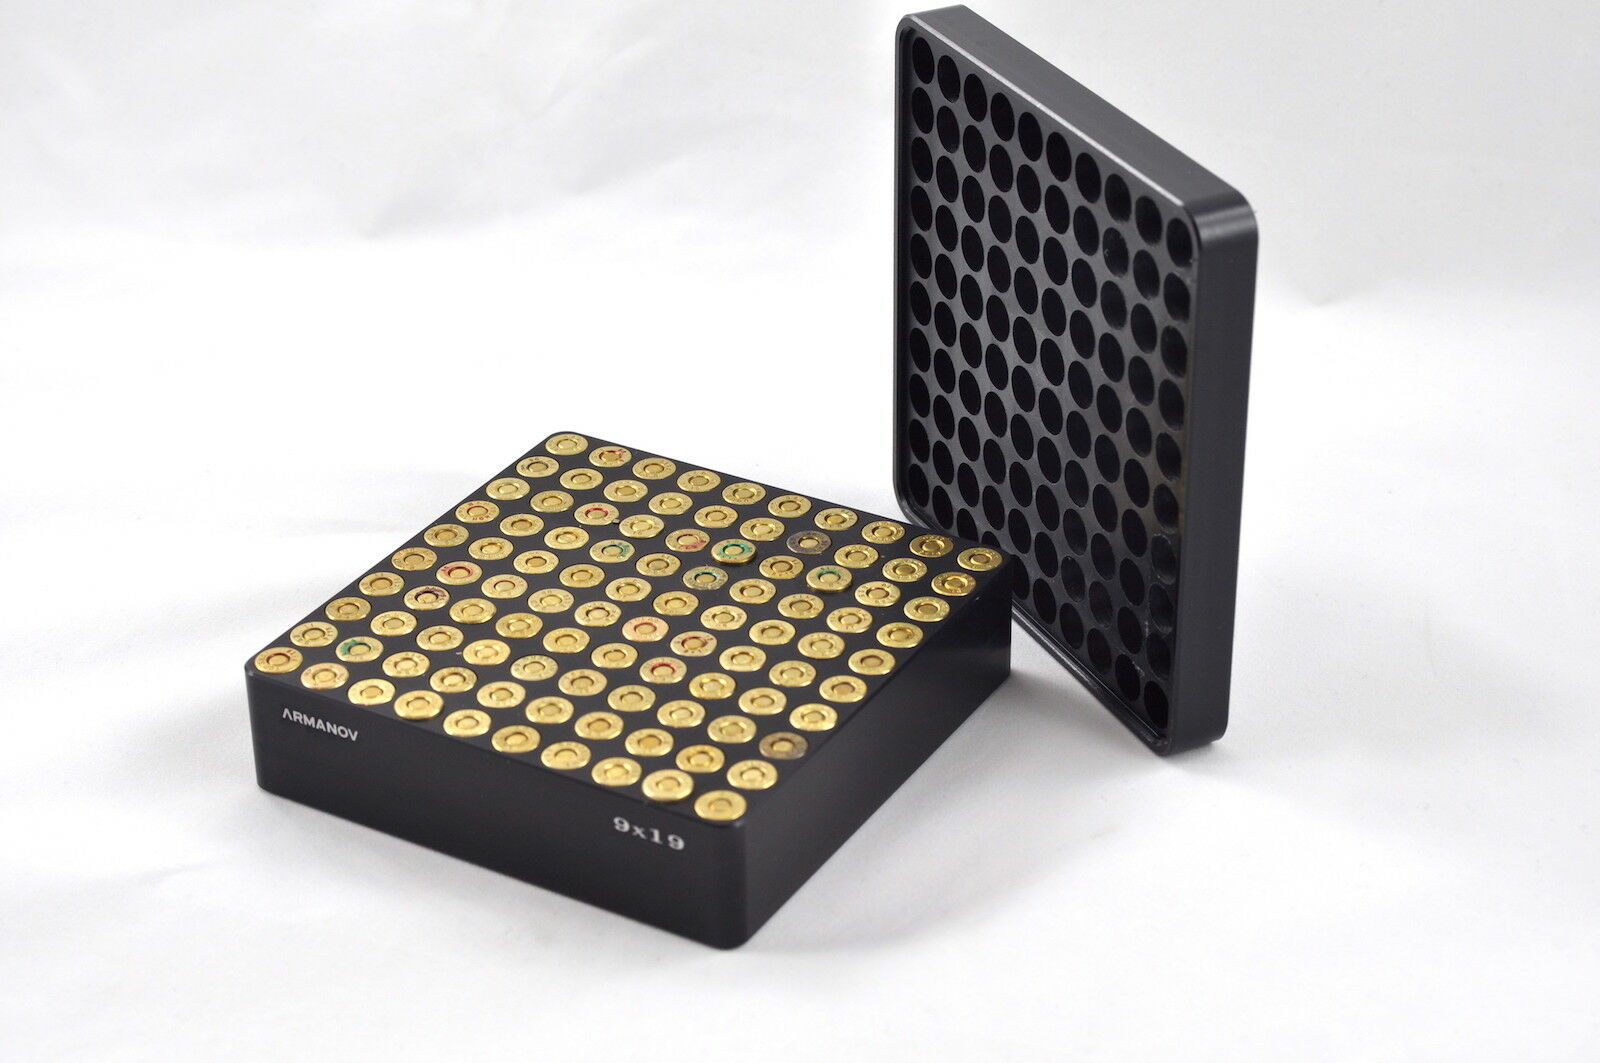 Aluminum Case Gauge box 100 rnd. with Flip Cover   9x19, .40S&W, .45ACP